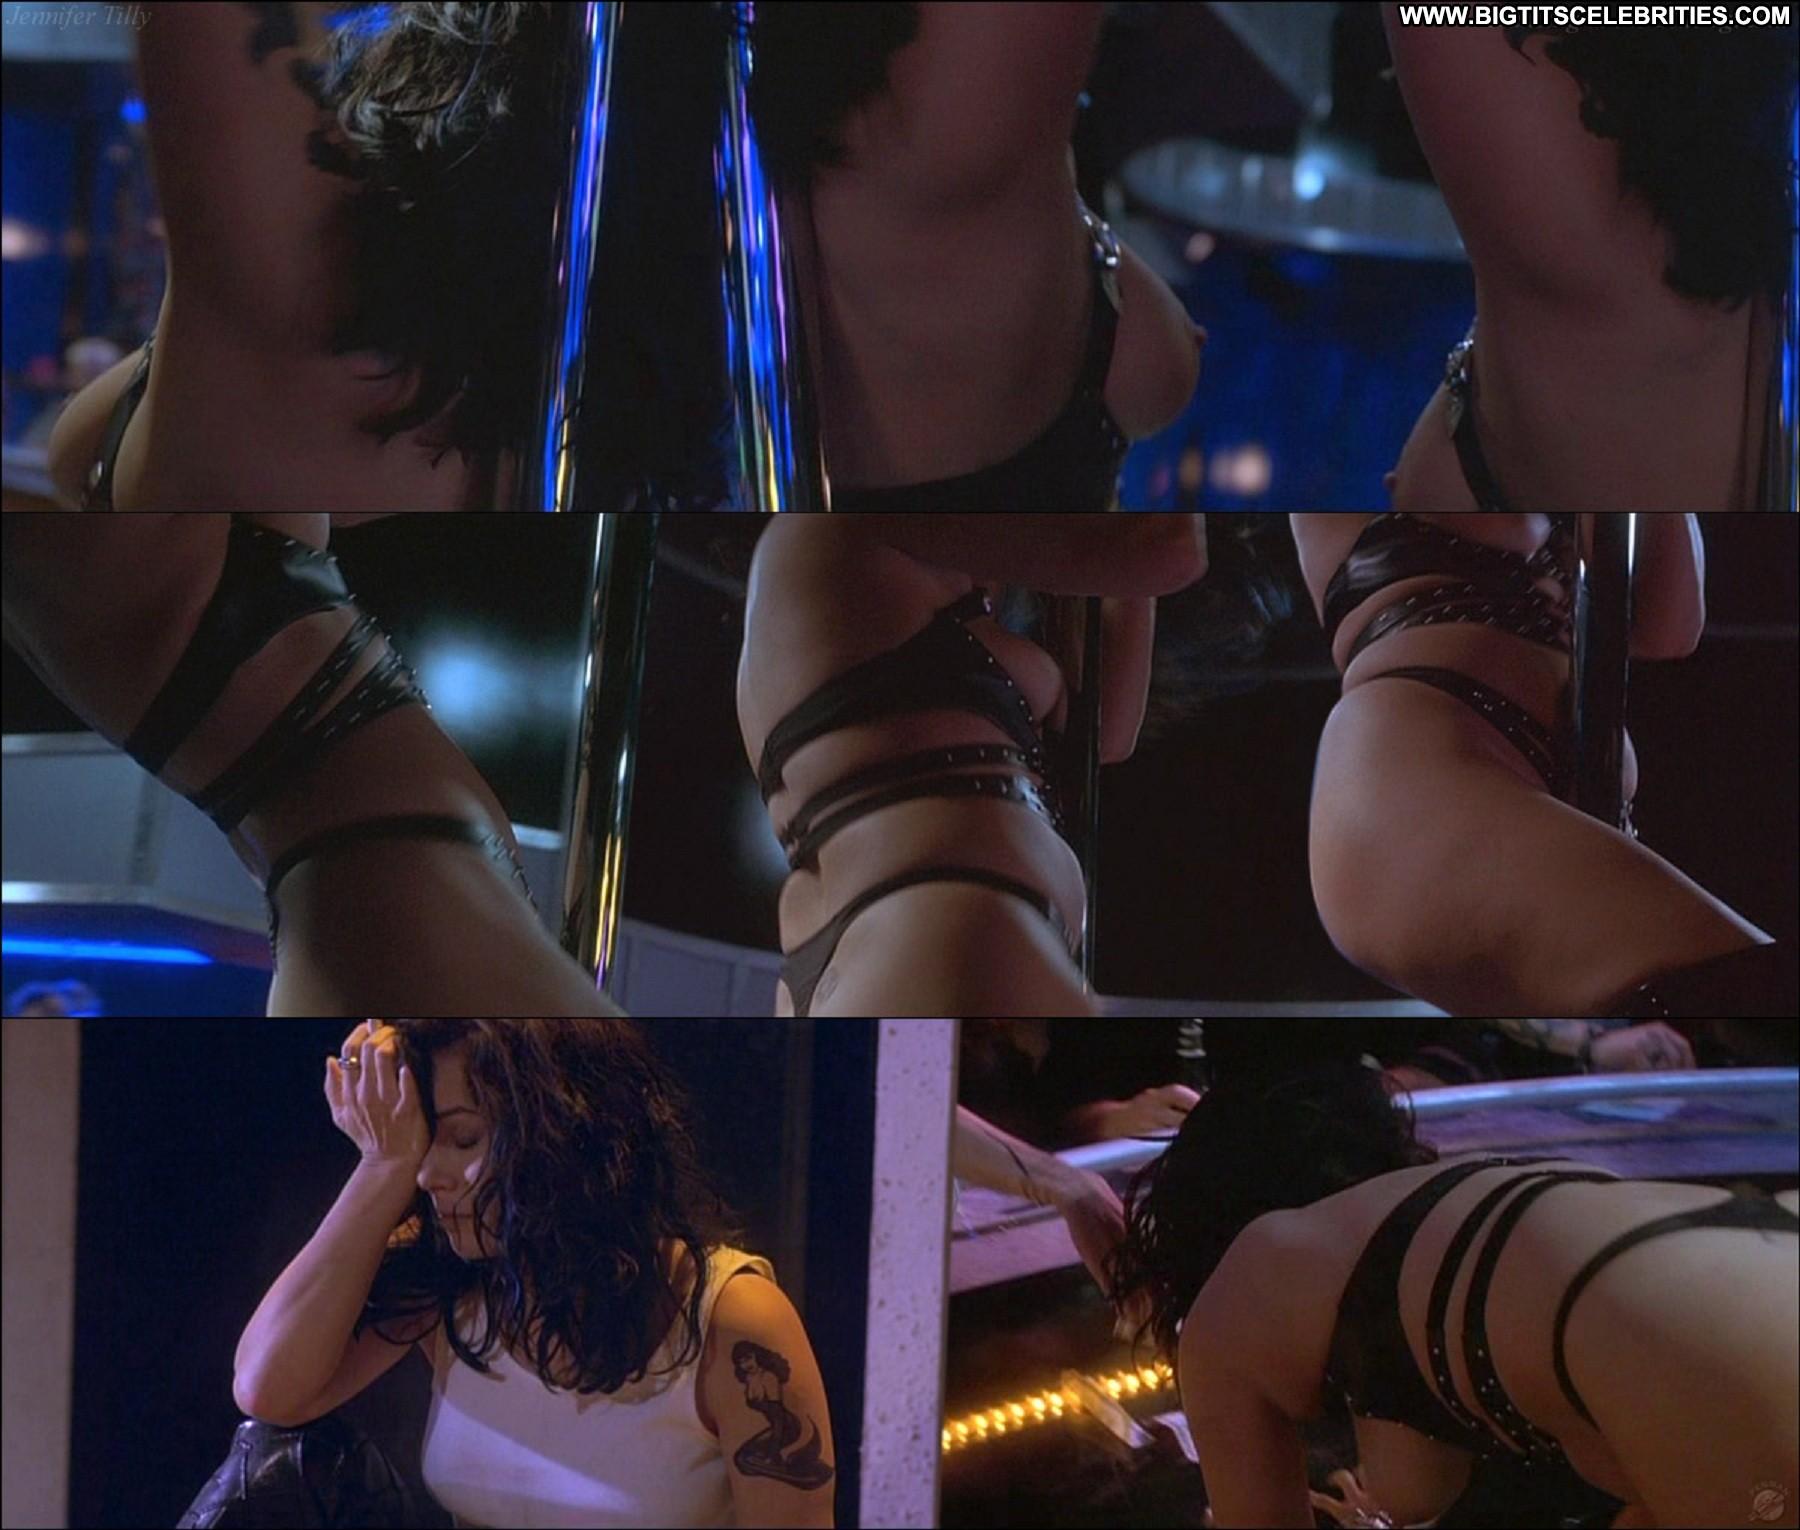 Jennifer Tilly Kissing Gina Gershon